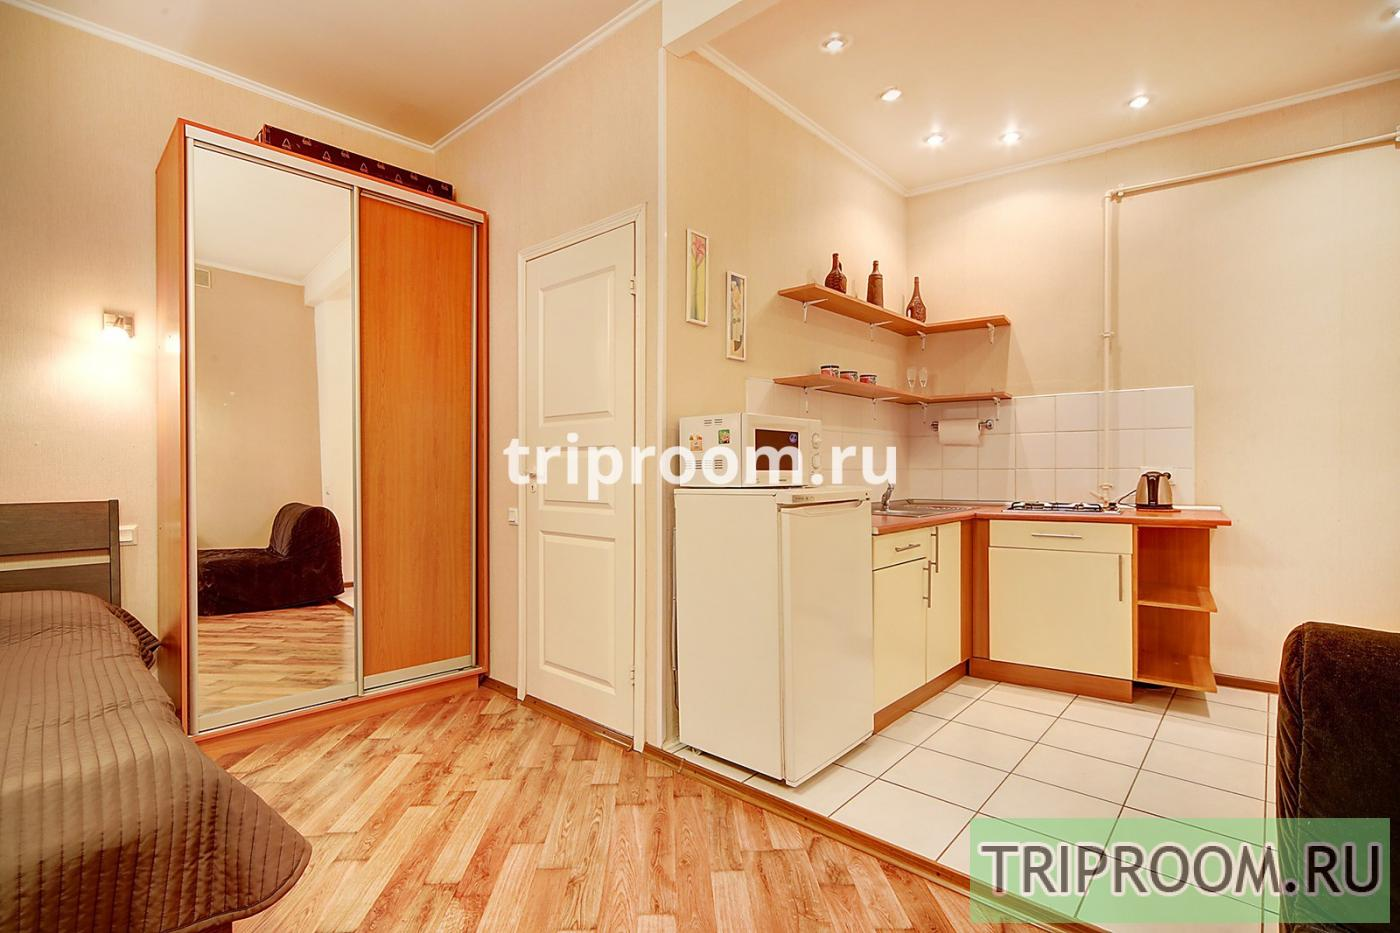 1-комнатная квартира посуточно (вариант № 15082), ул. Невский проспект, фото № 5